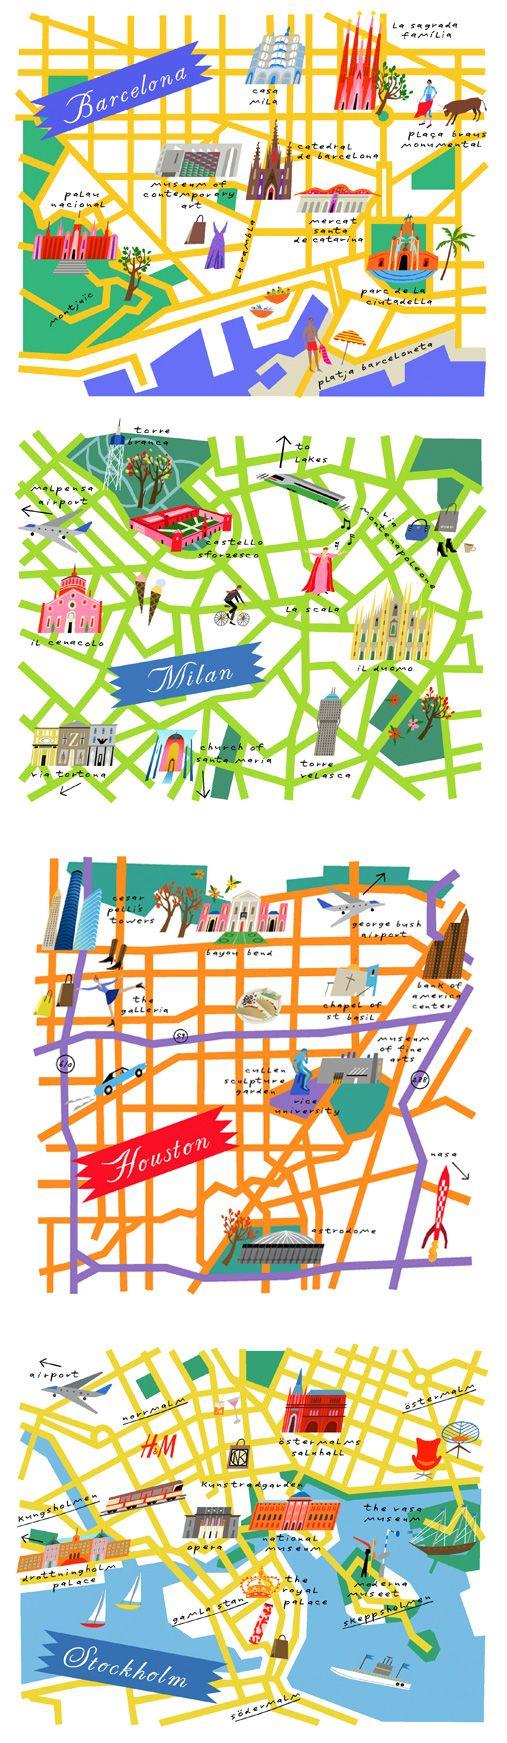 Lena Corwin's maps